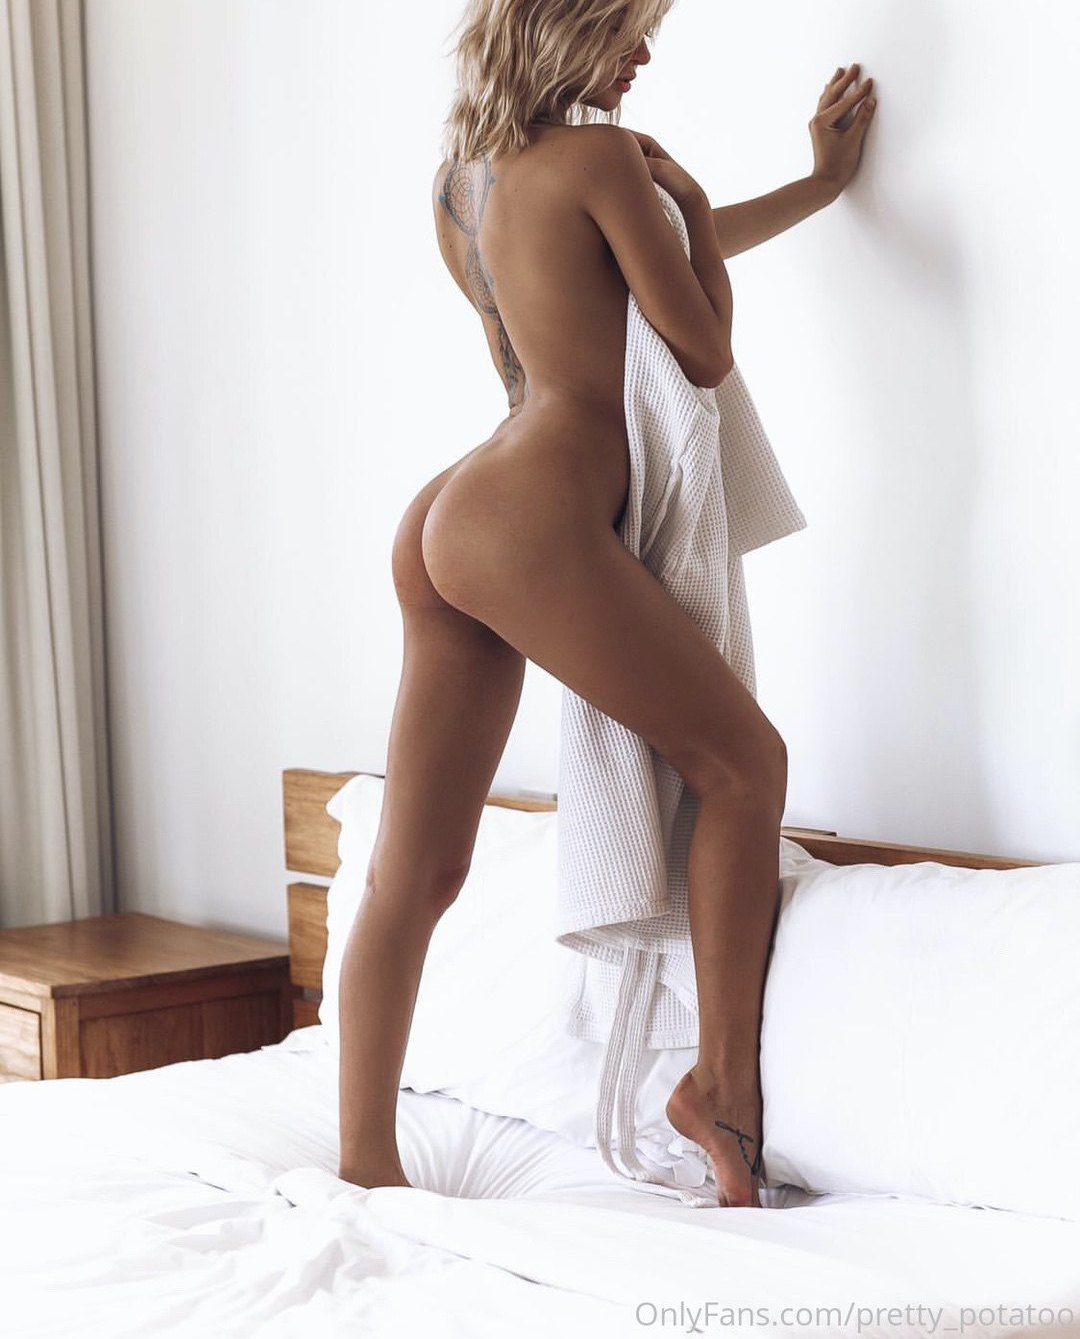 Janna Pavlova Pretty Potatoo Onlyfans Nudes Leaks 0014